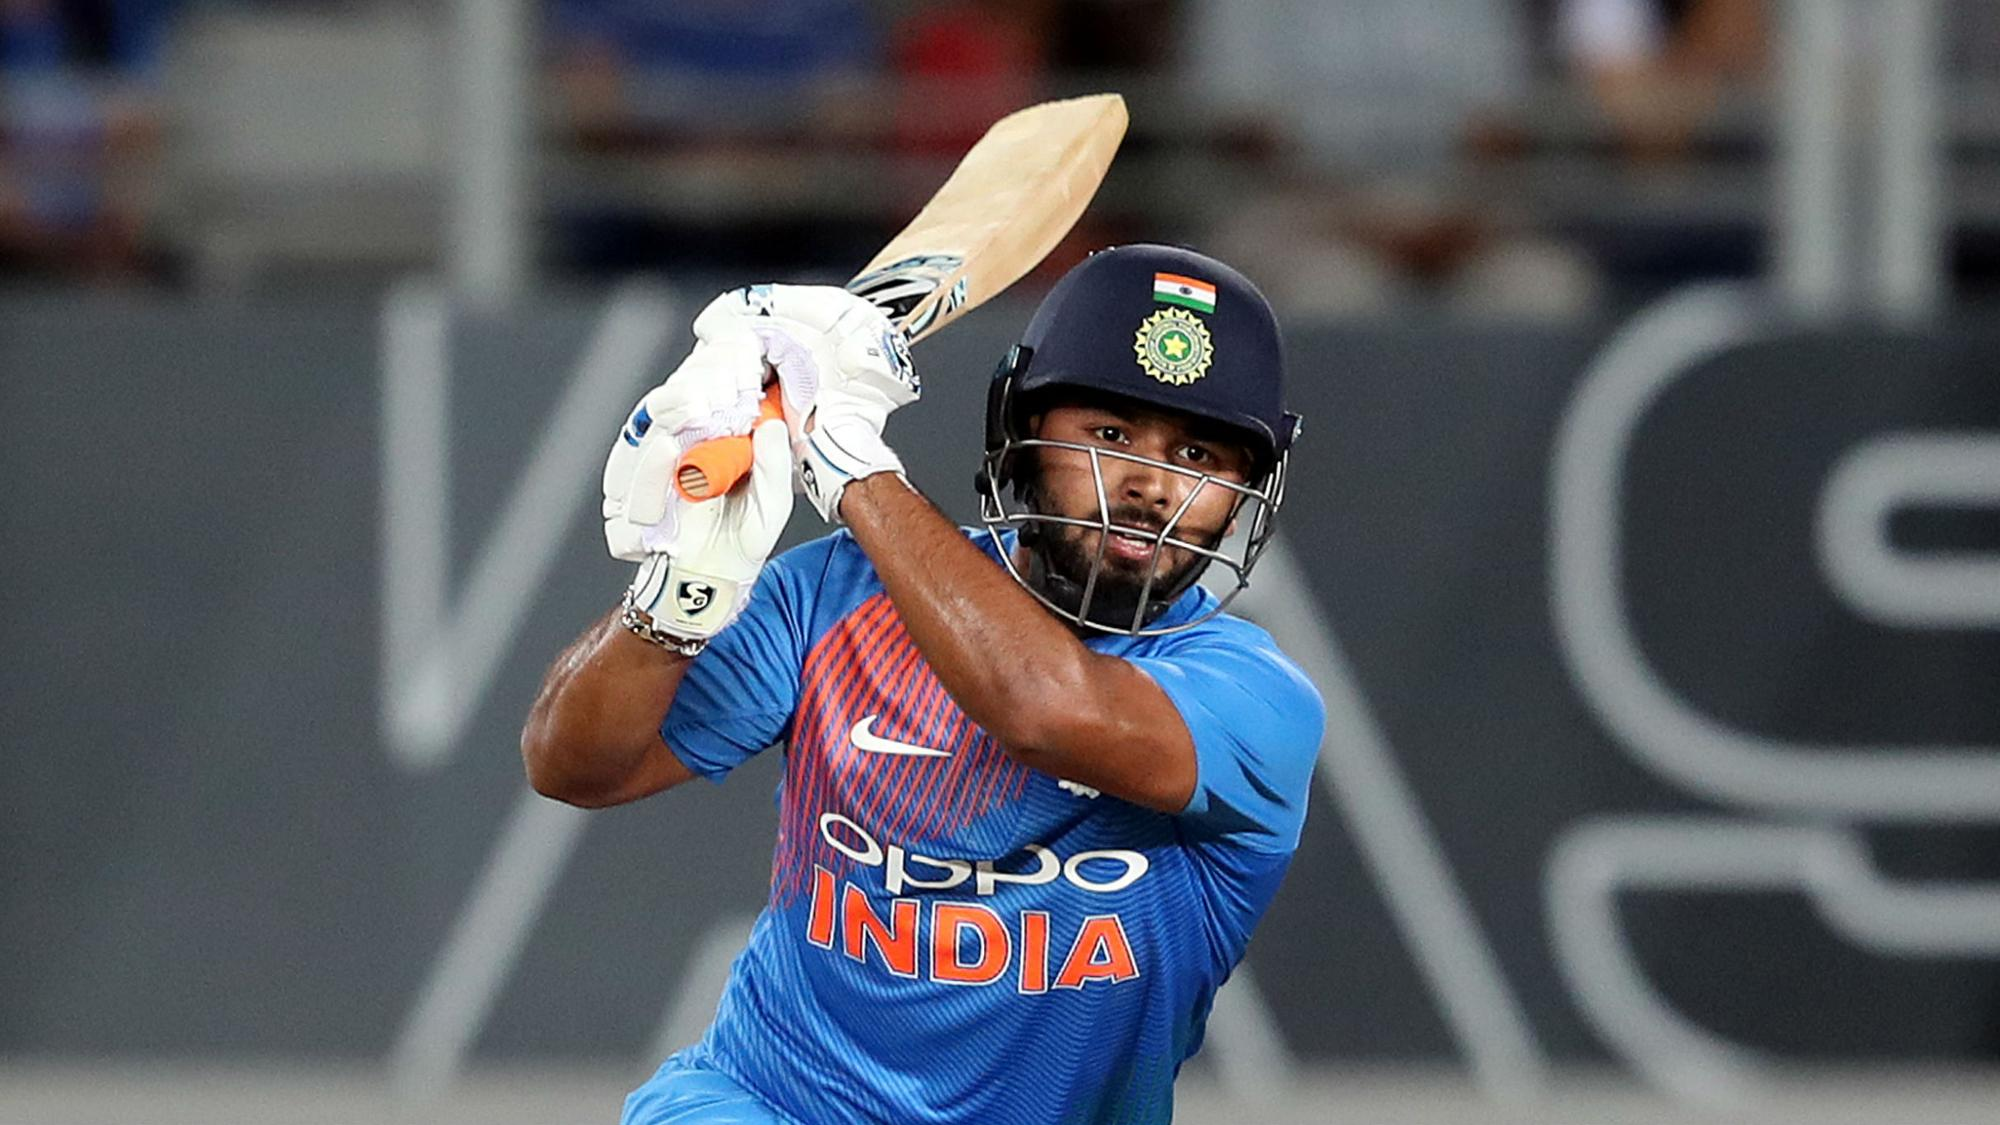 Ashish Nehra backs 'pure match-winner' Rishabh Pant for World Cup selection